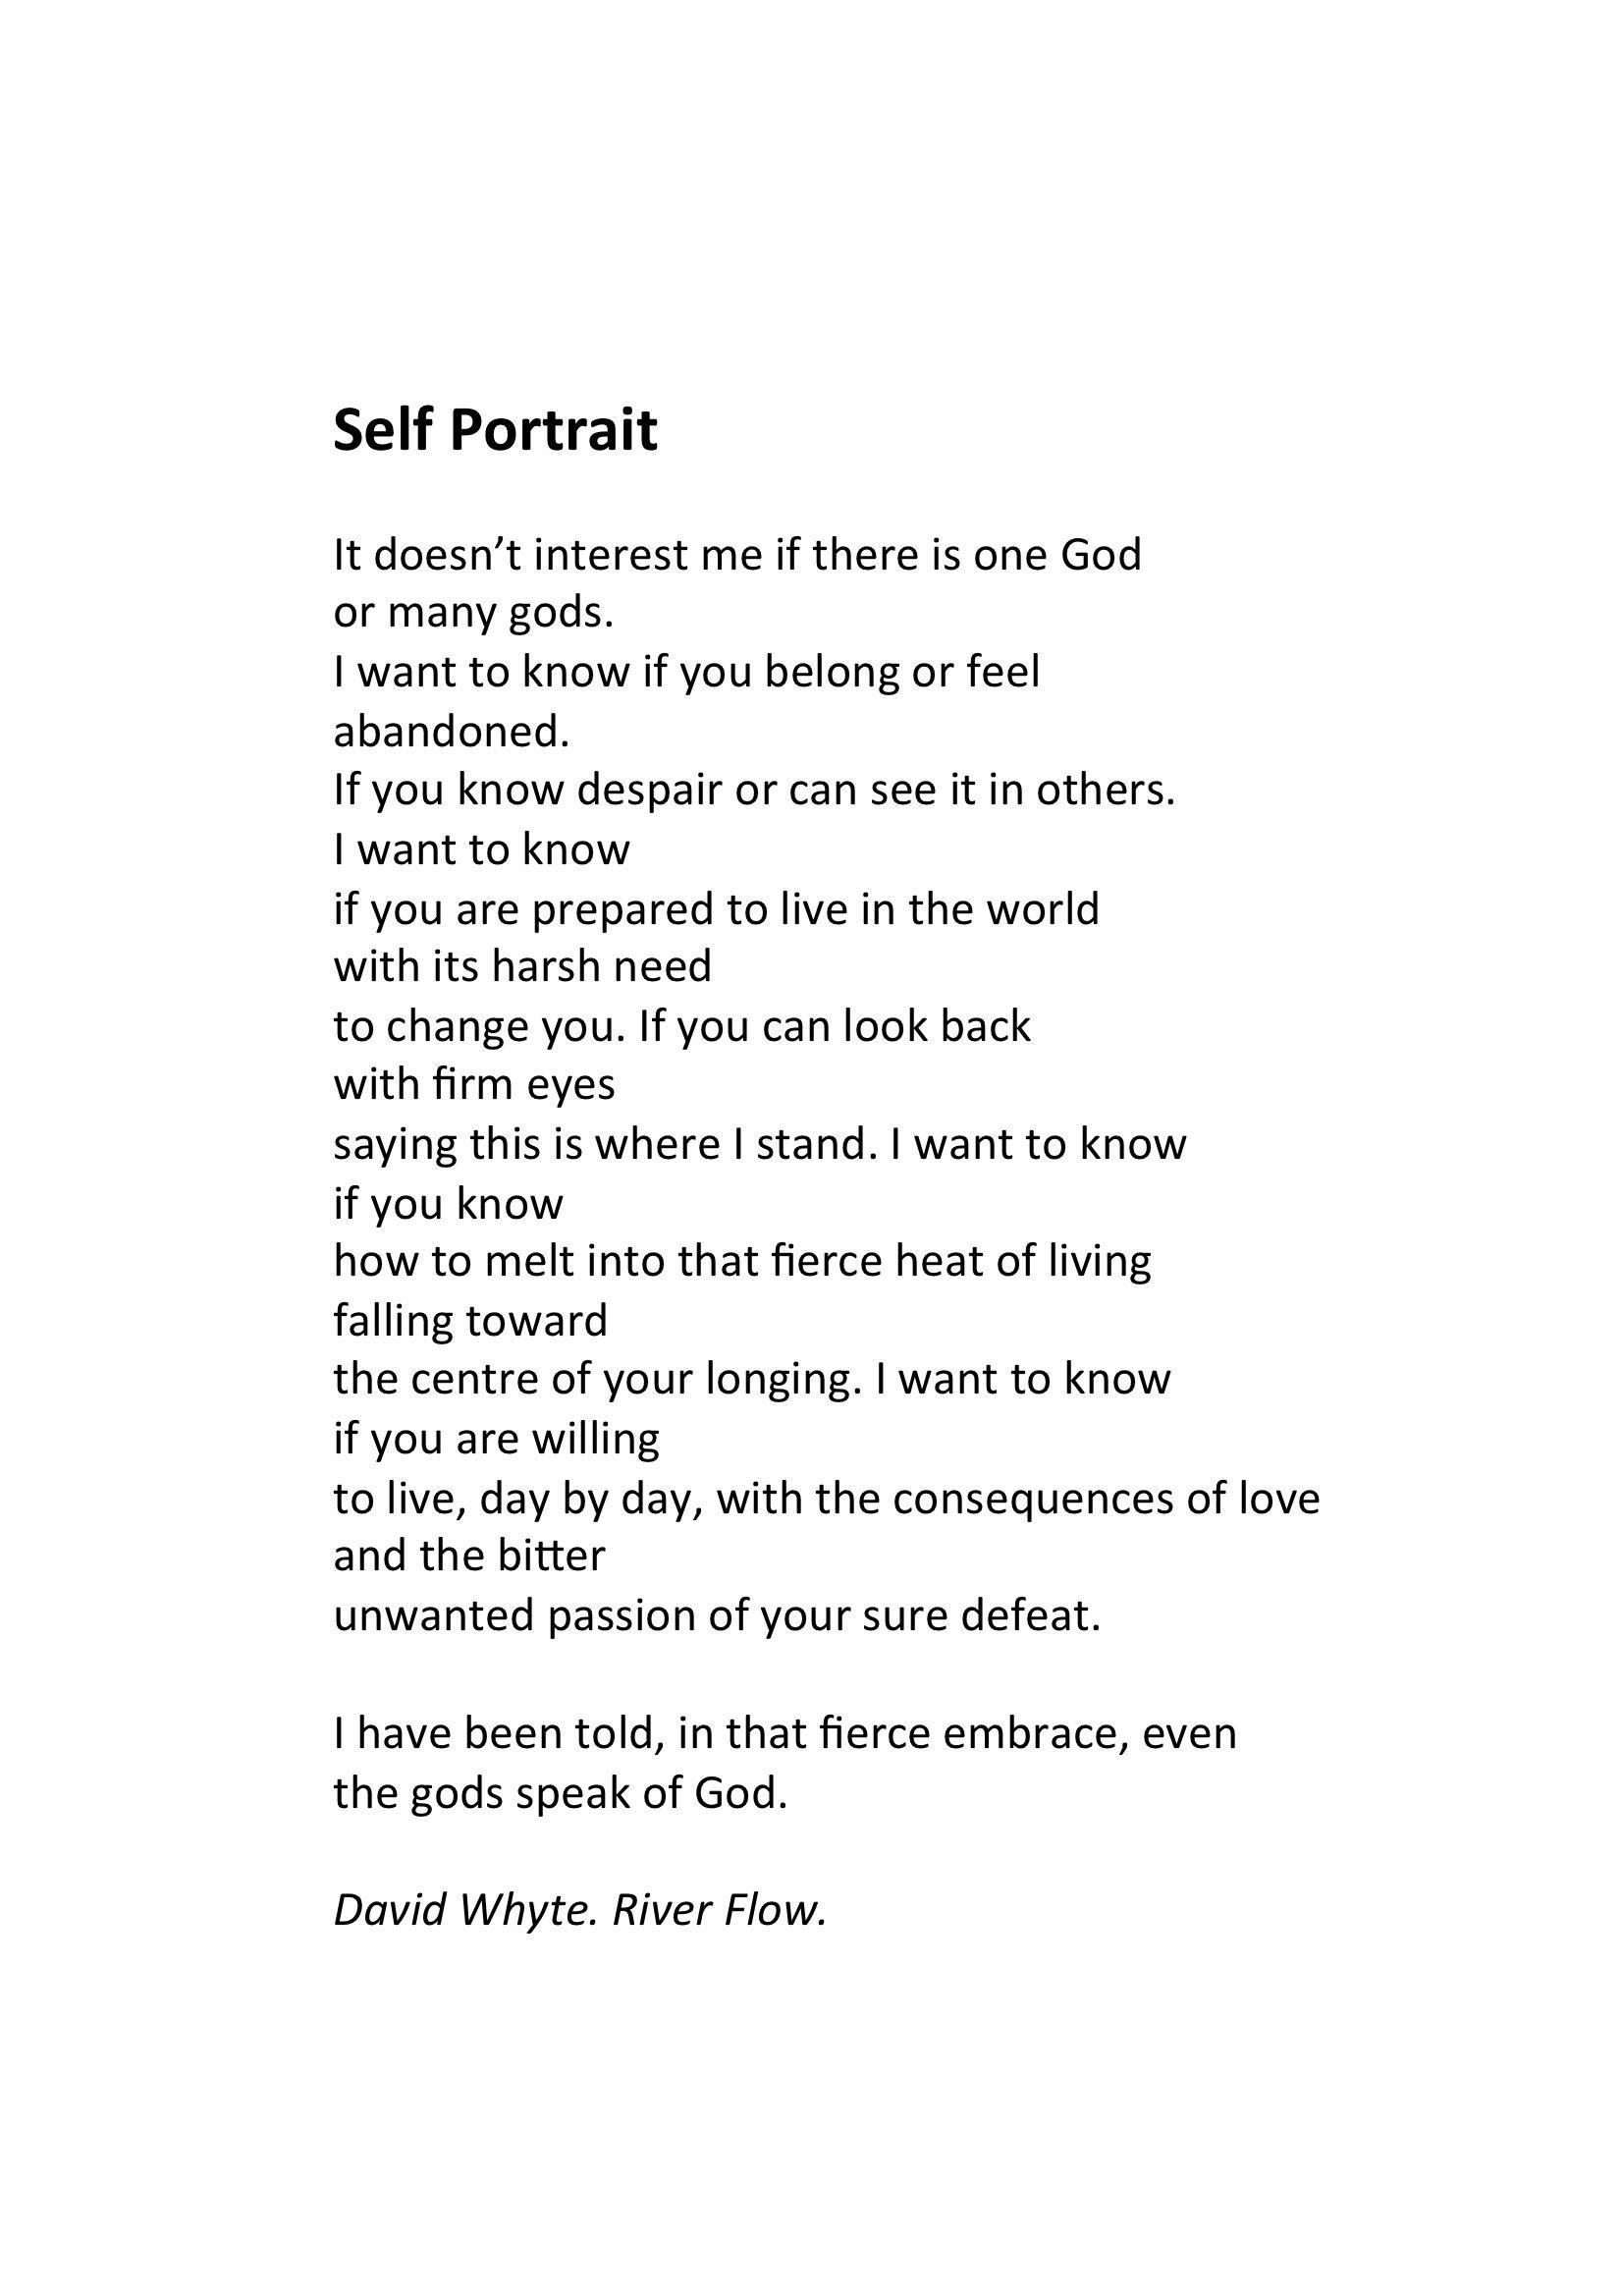 David Whyte Poem 2 November 1955 Age 59 Mirfield